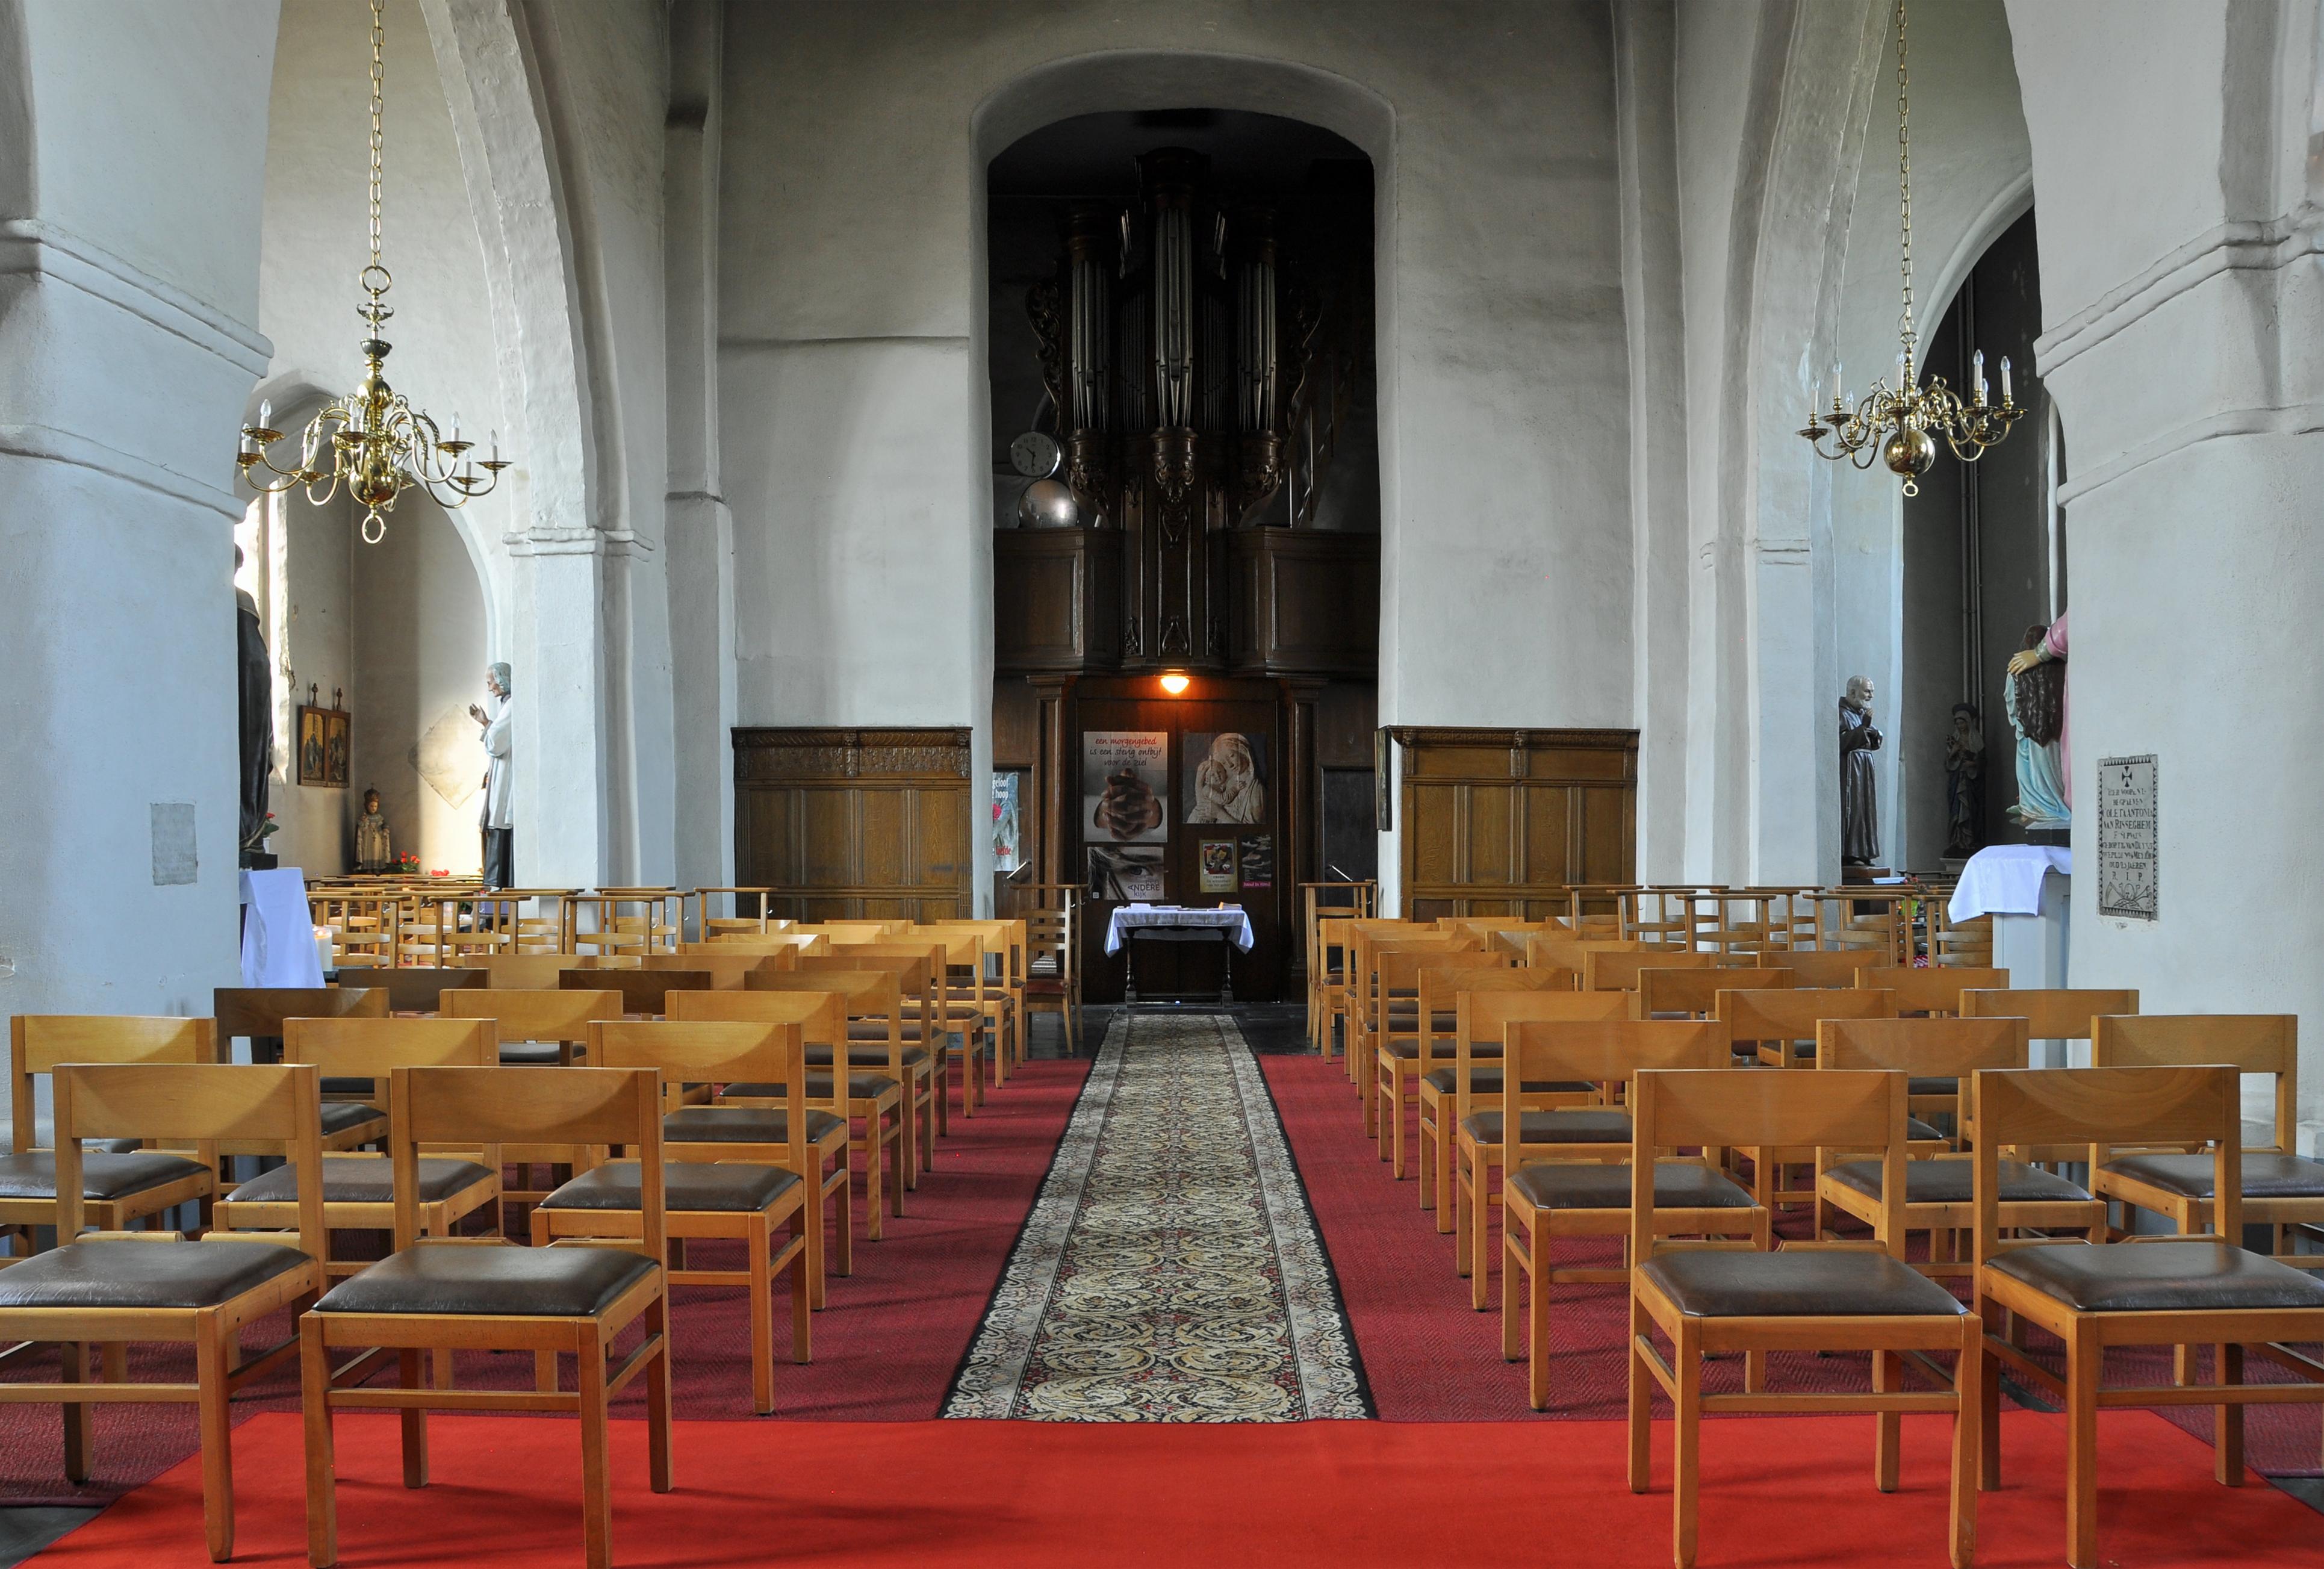 https://upload.wikimedia.org/wikipedia/commons/3/3c/Meetkerke_Interieur_Kerk_R02.jpg